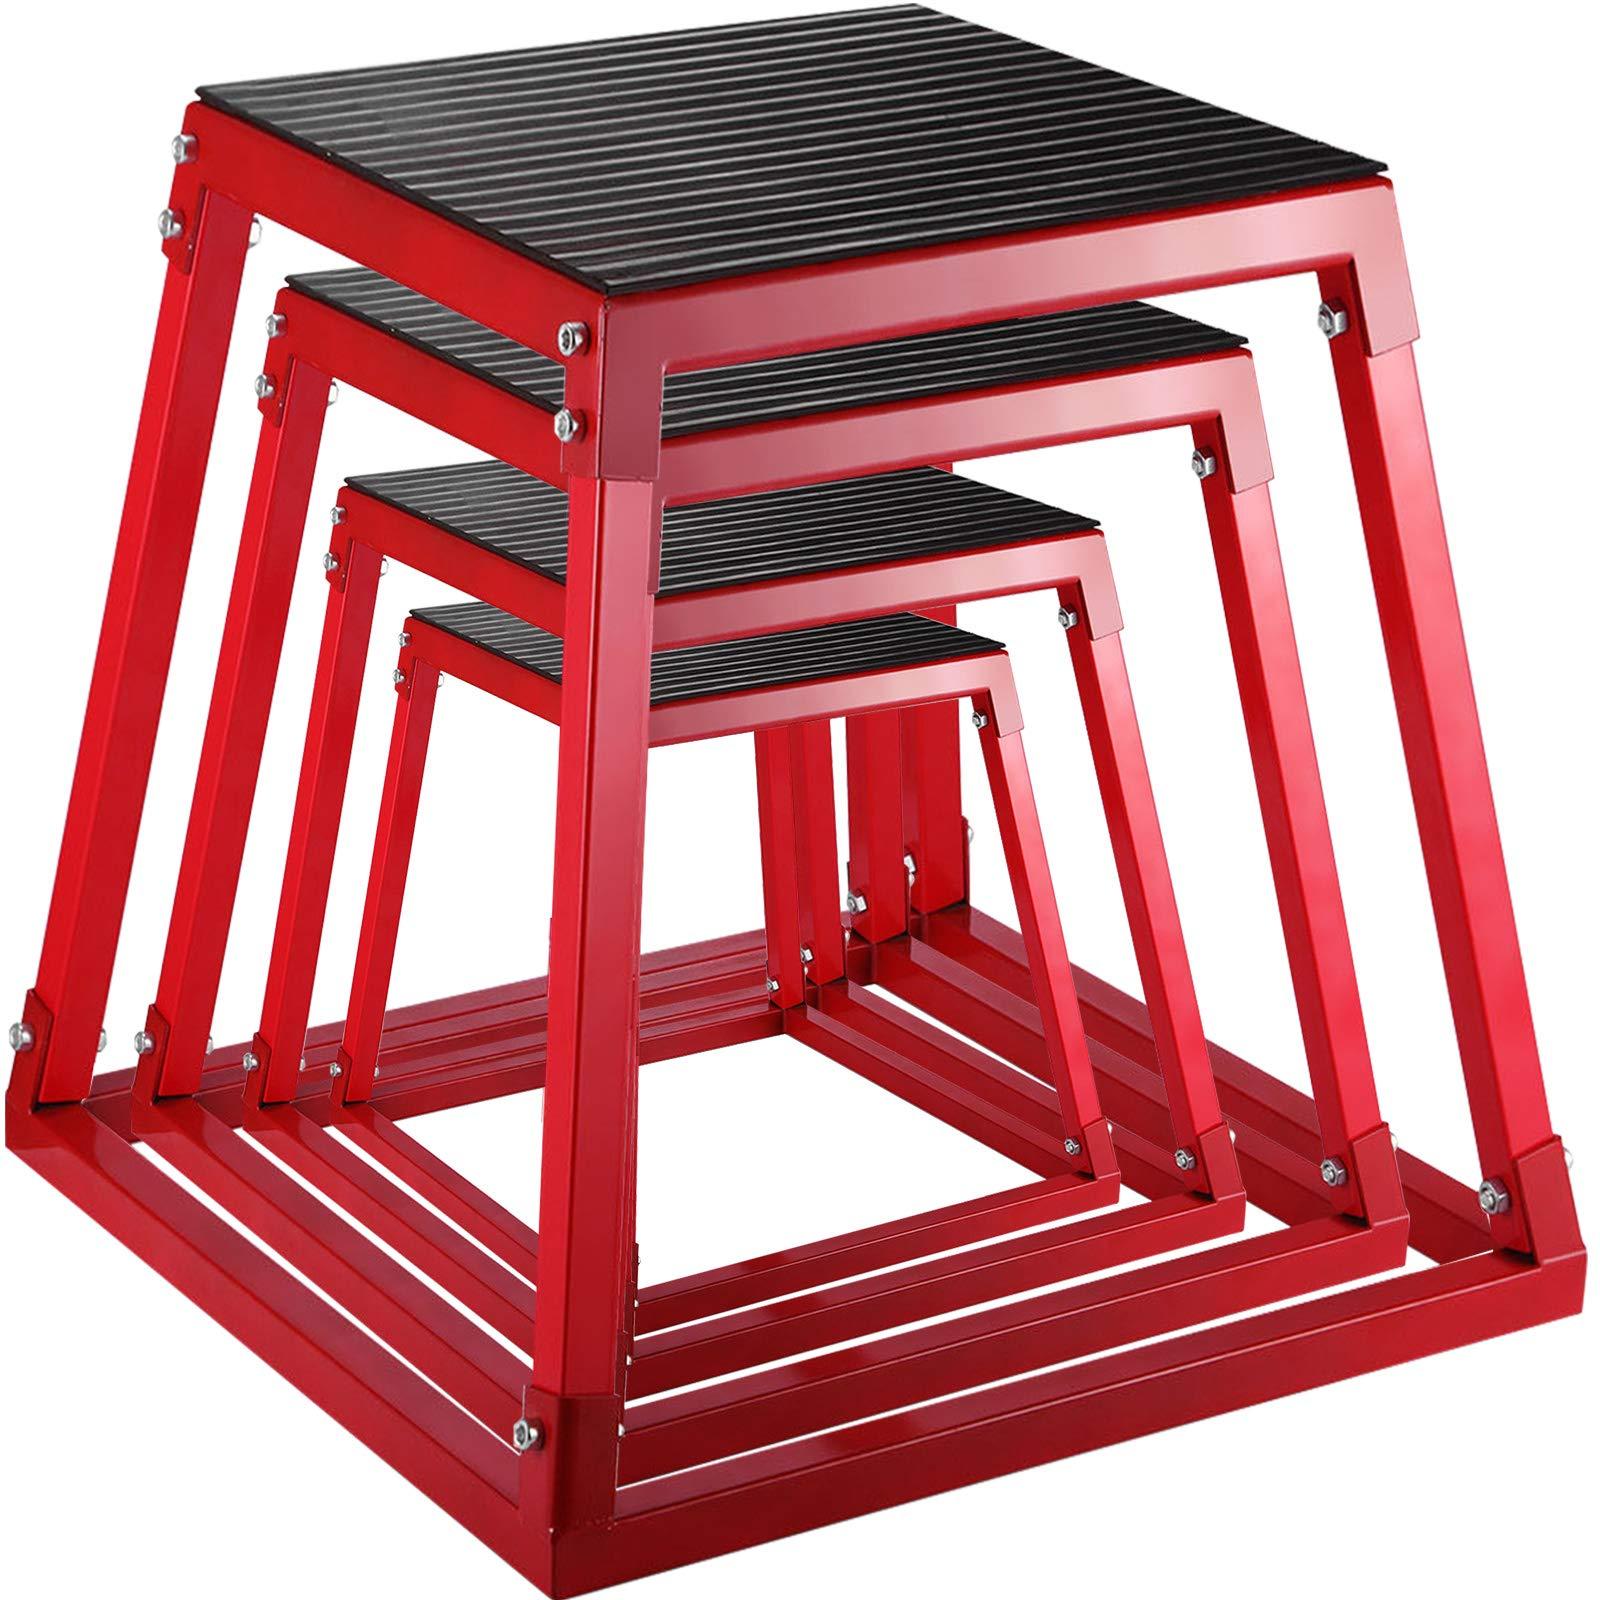 Frantools 4Pics Plyometric Box Pliométrico Caja Pliométrico Plataforma Caja de Salto Caja Pliometrica Salto Cajón Pliometrico Cajones de Salto Juego de 4 de 12 /18 /24 /30